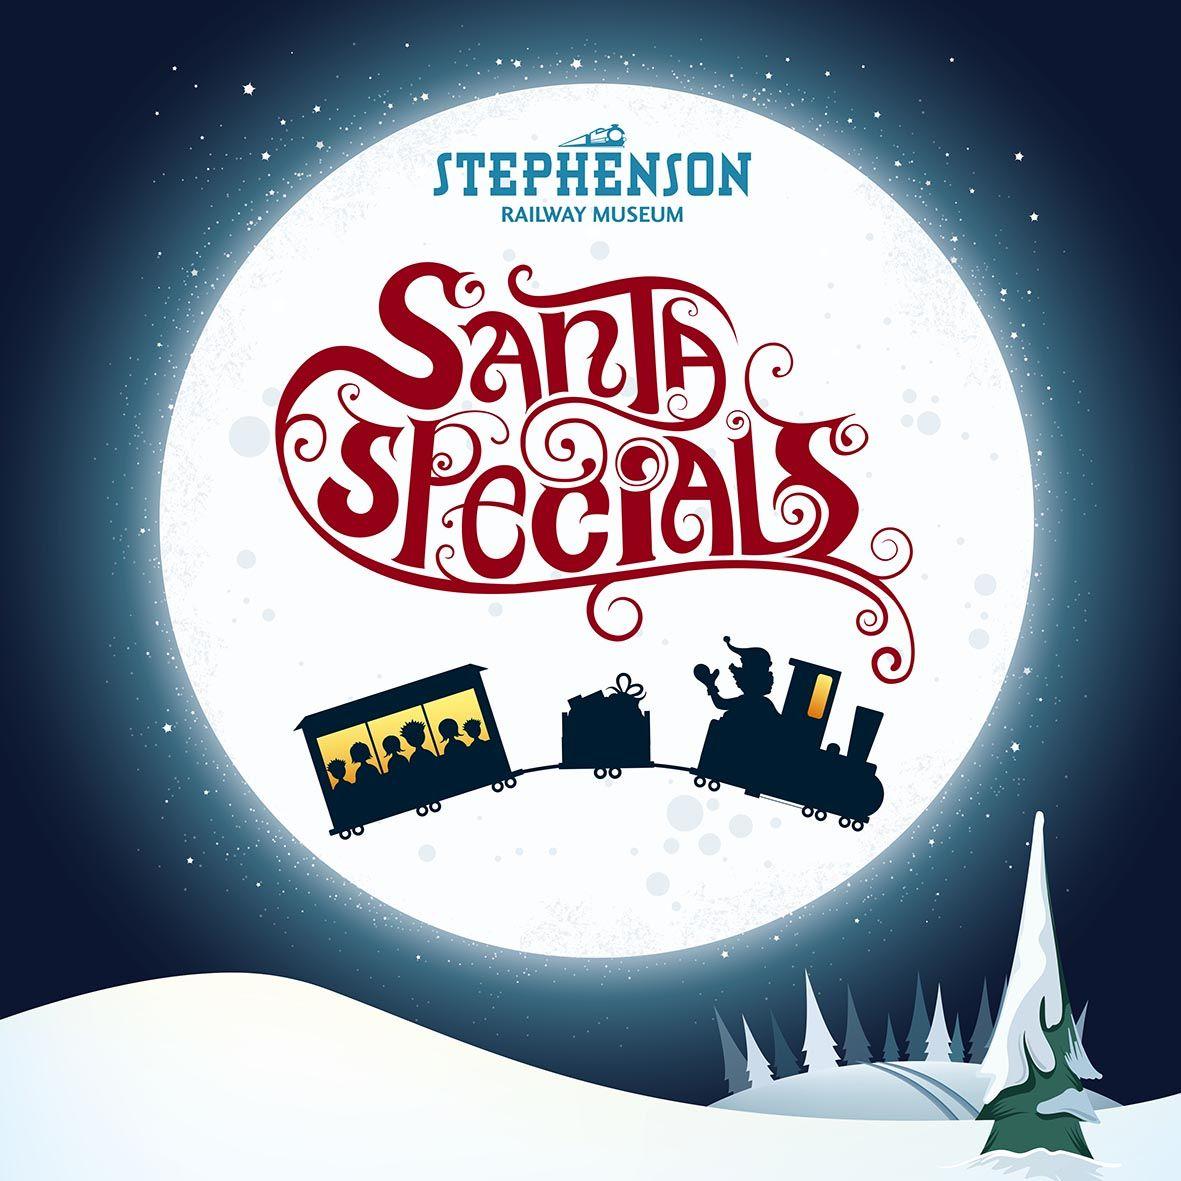 Christmas Specials 2019.Santa Specials 2019 At Stephenson Railway Museum Event